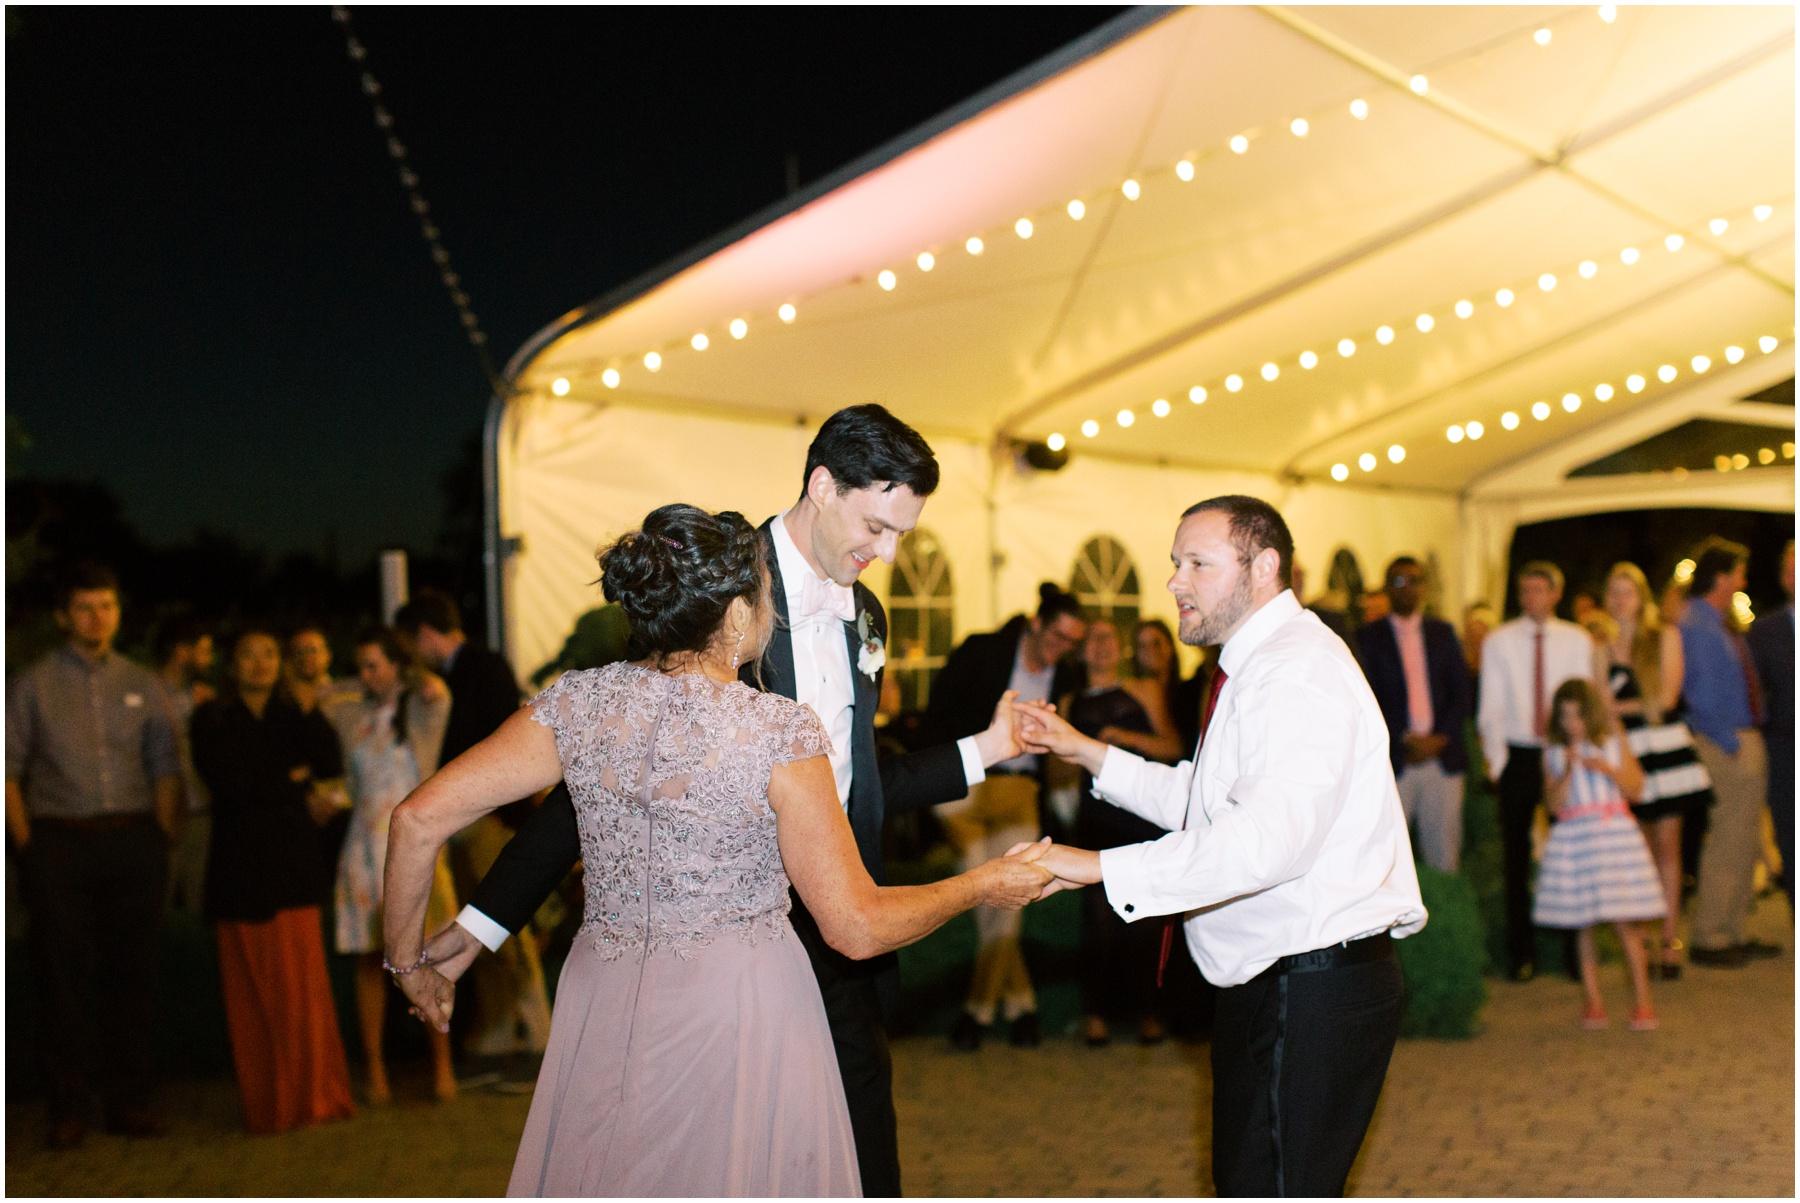 Scribner-bend-vineyards-wedding-sacramento-california-Kristine-Herman-Photography-210.jpg